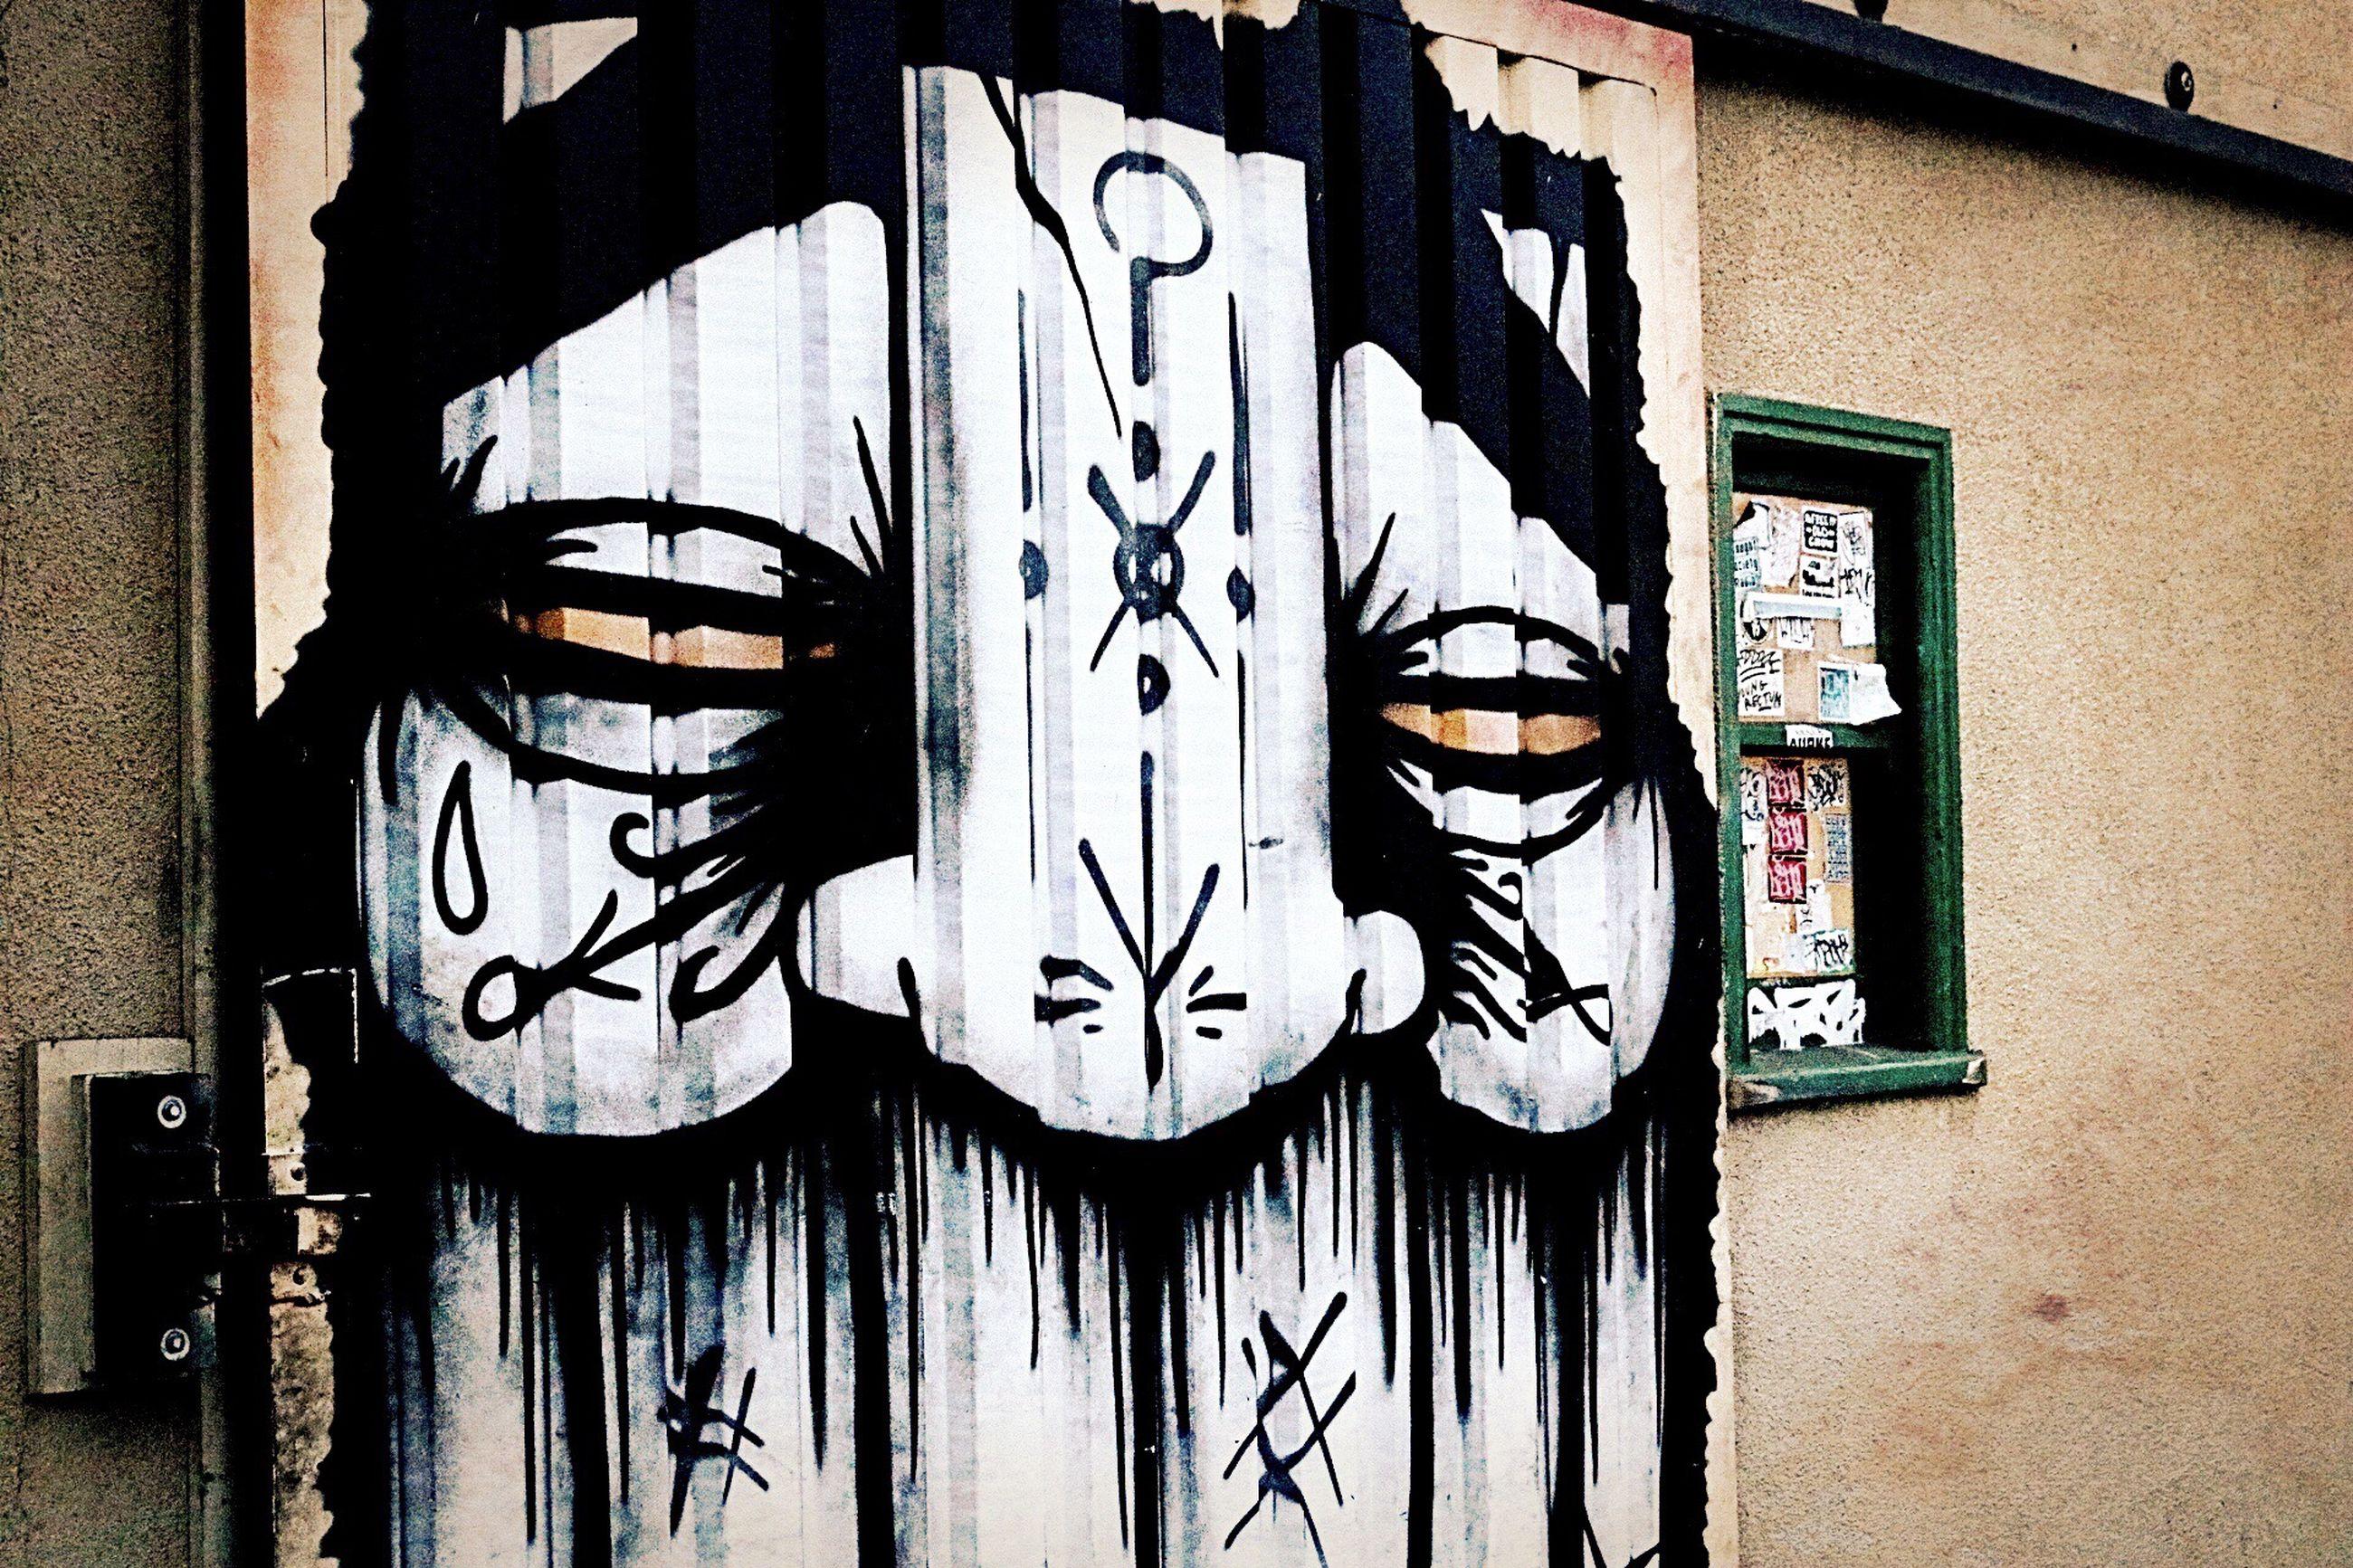 graffiti, architecture, art, built structure, wall - building feature, creativity, art and craft, building exterior, text, street art, wall, western script, human representation, communication, brick wall, outdoors, vandalism, day, mural